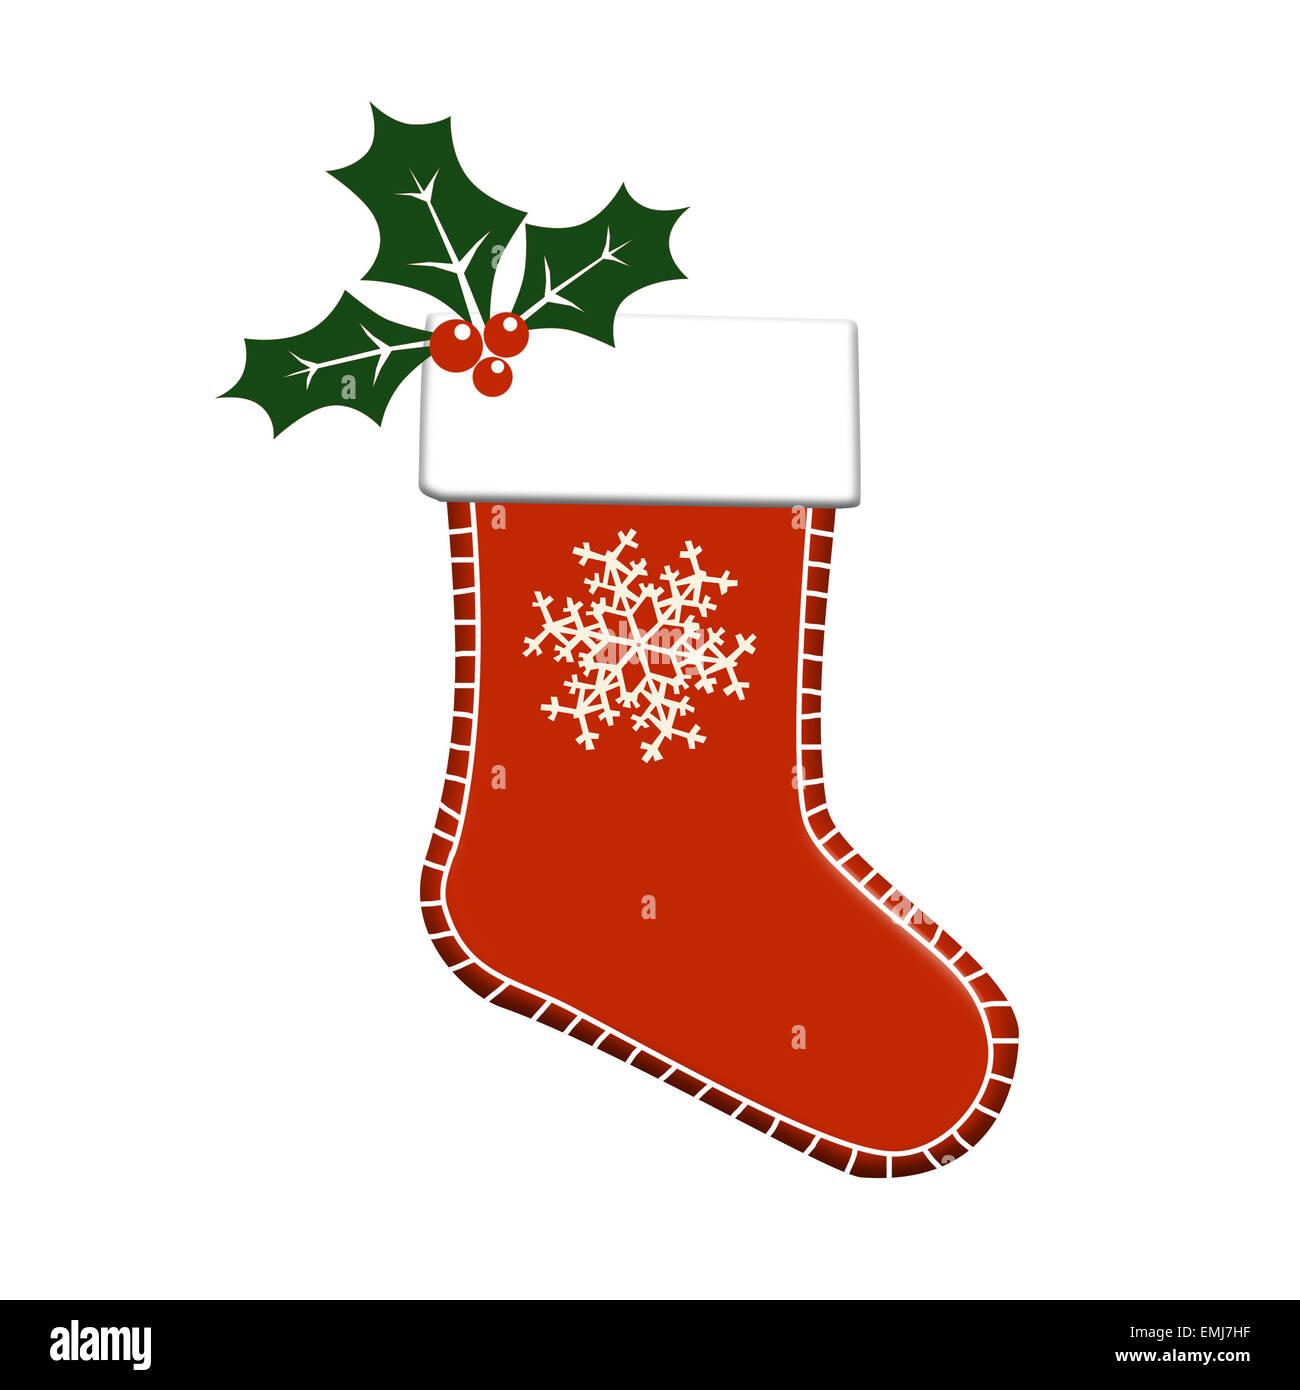 Christmas Stockings Illustration Stock Photos & Christmas Stockings ...